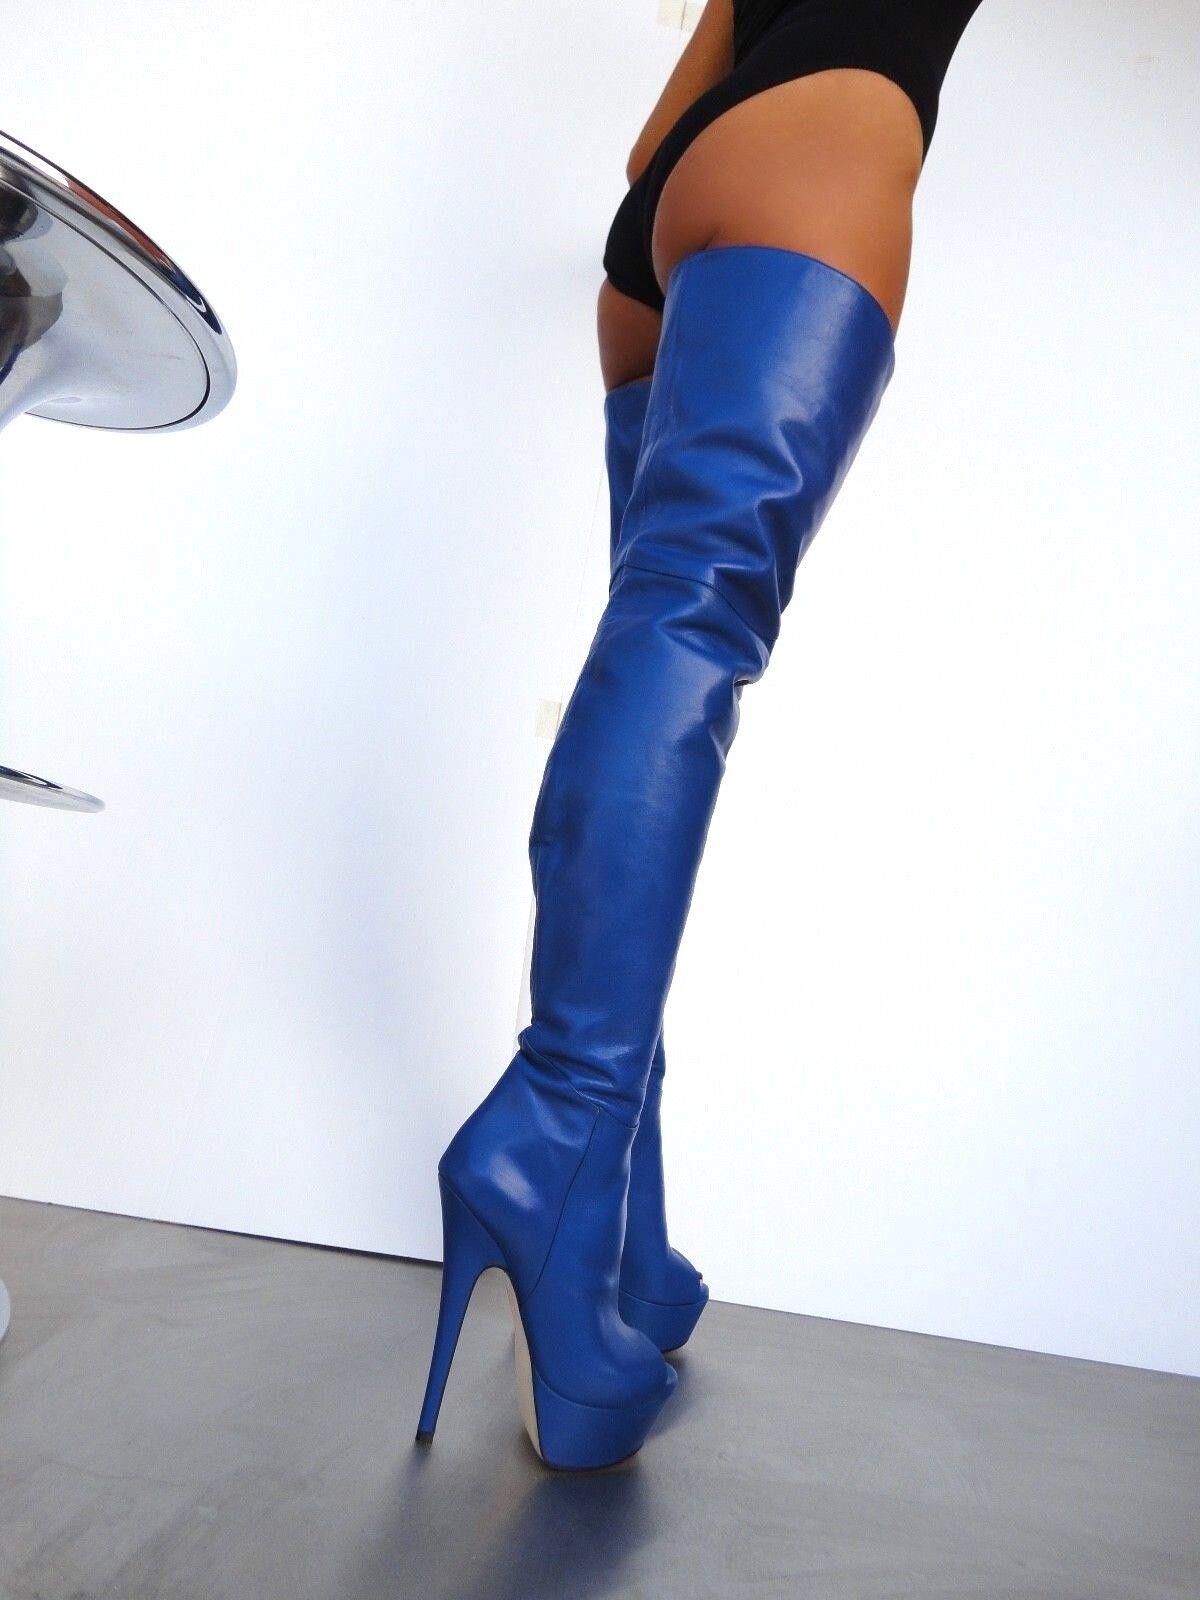 CQ COUTURE silverFORMA PEEP TOE OVERKNEE BOOTS STIEFEL BOTAS BOTAS BOTAS LEATHER blue blue 35 35d9f9